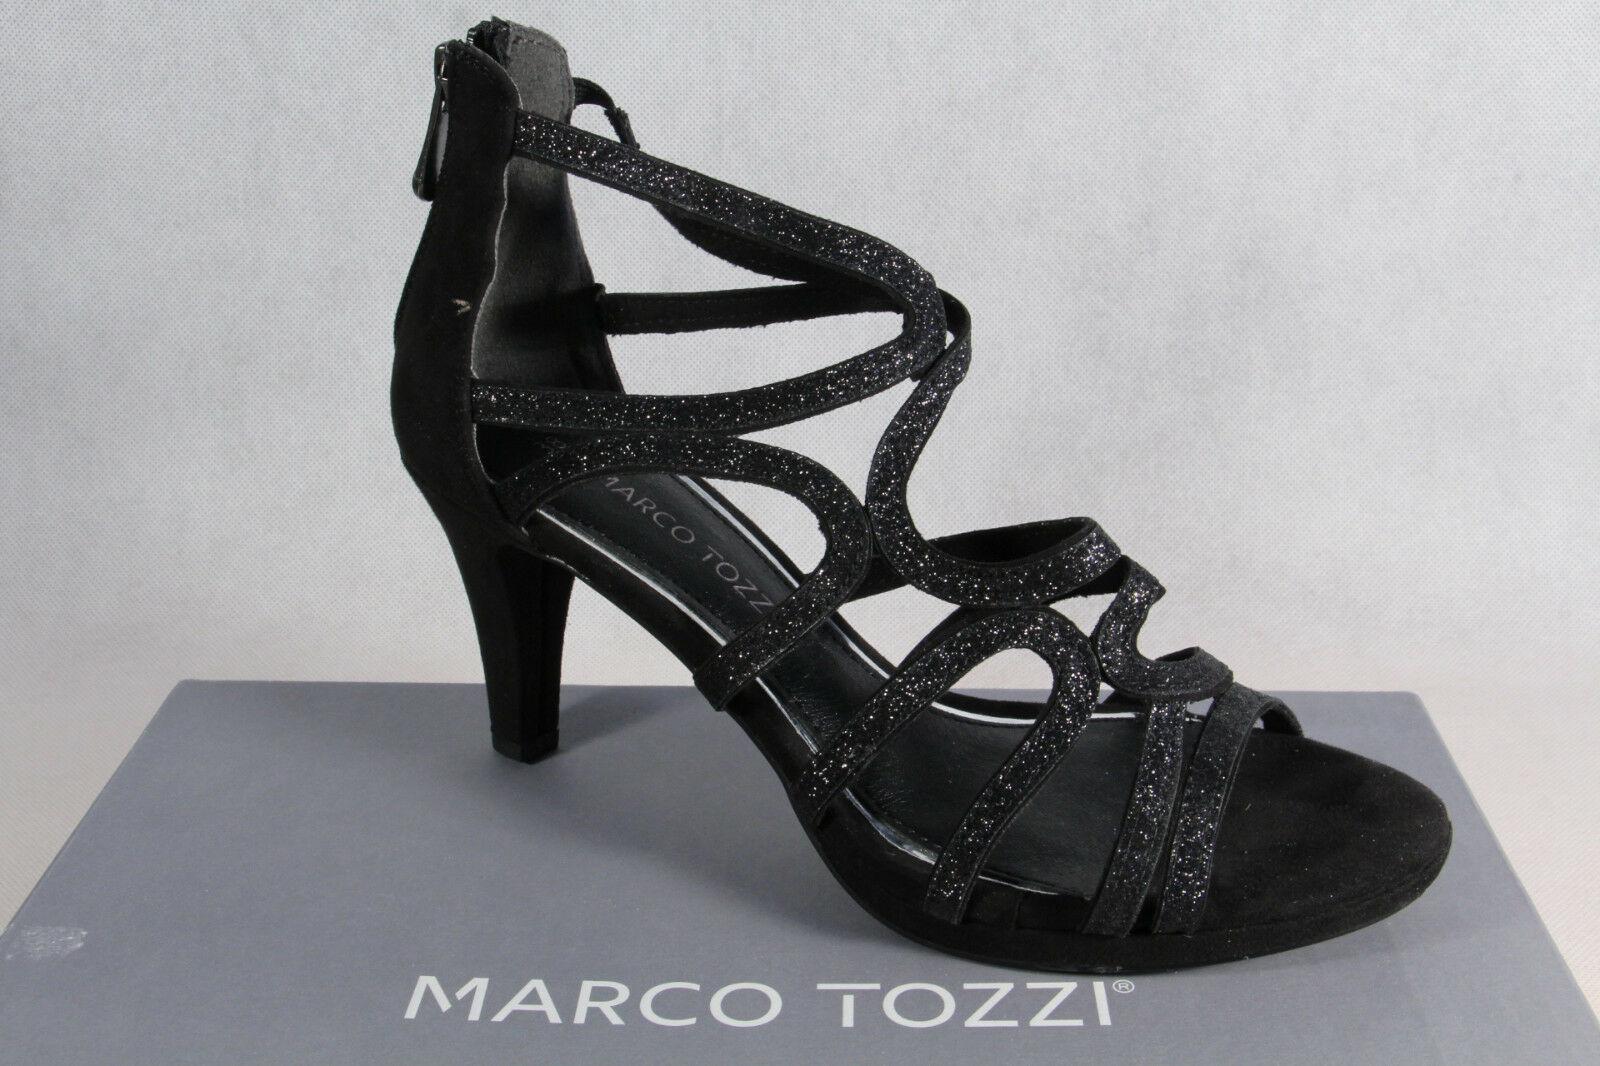 low cost 14ce4 3e937 MARCO TOZZI Leder Schuhe Sandaletten NEU